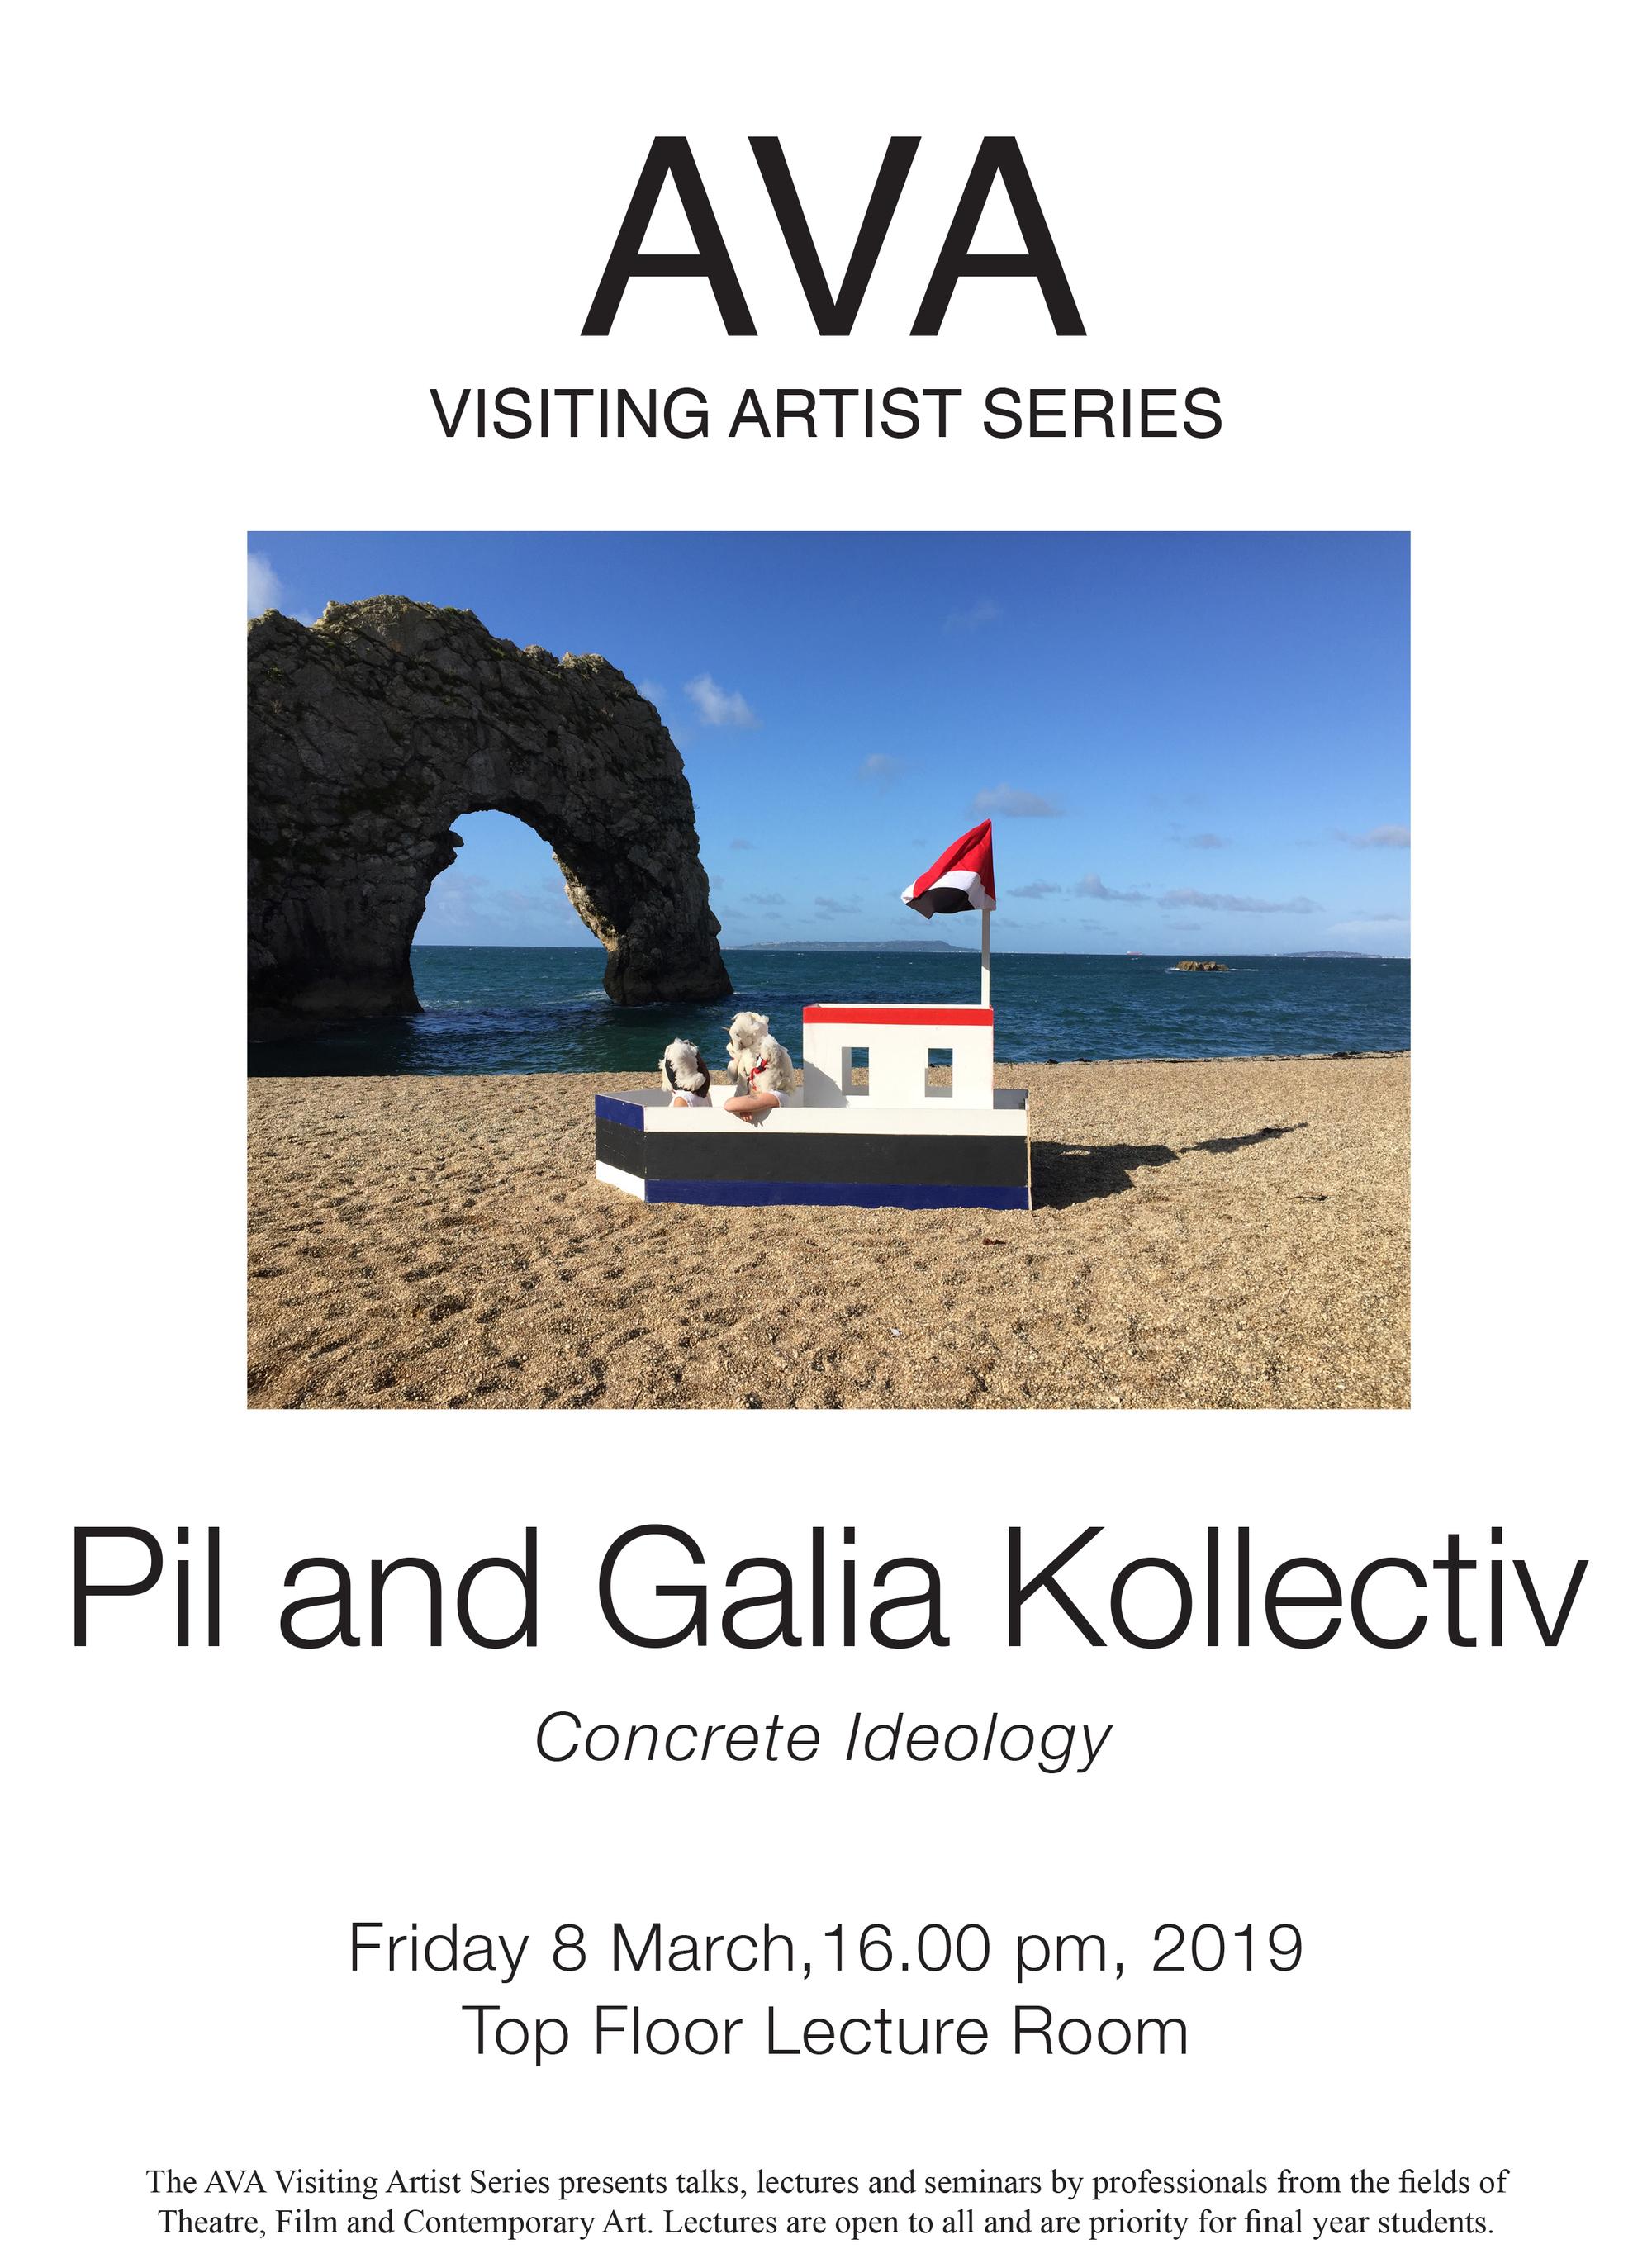 Gostujoči umetniki: Pil and Galia Kollectiv